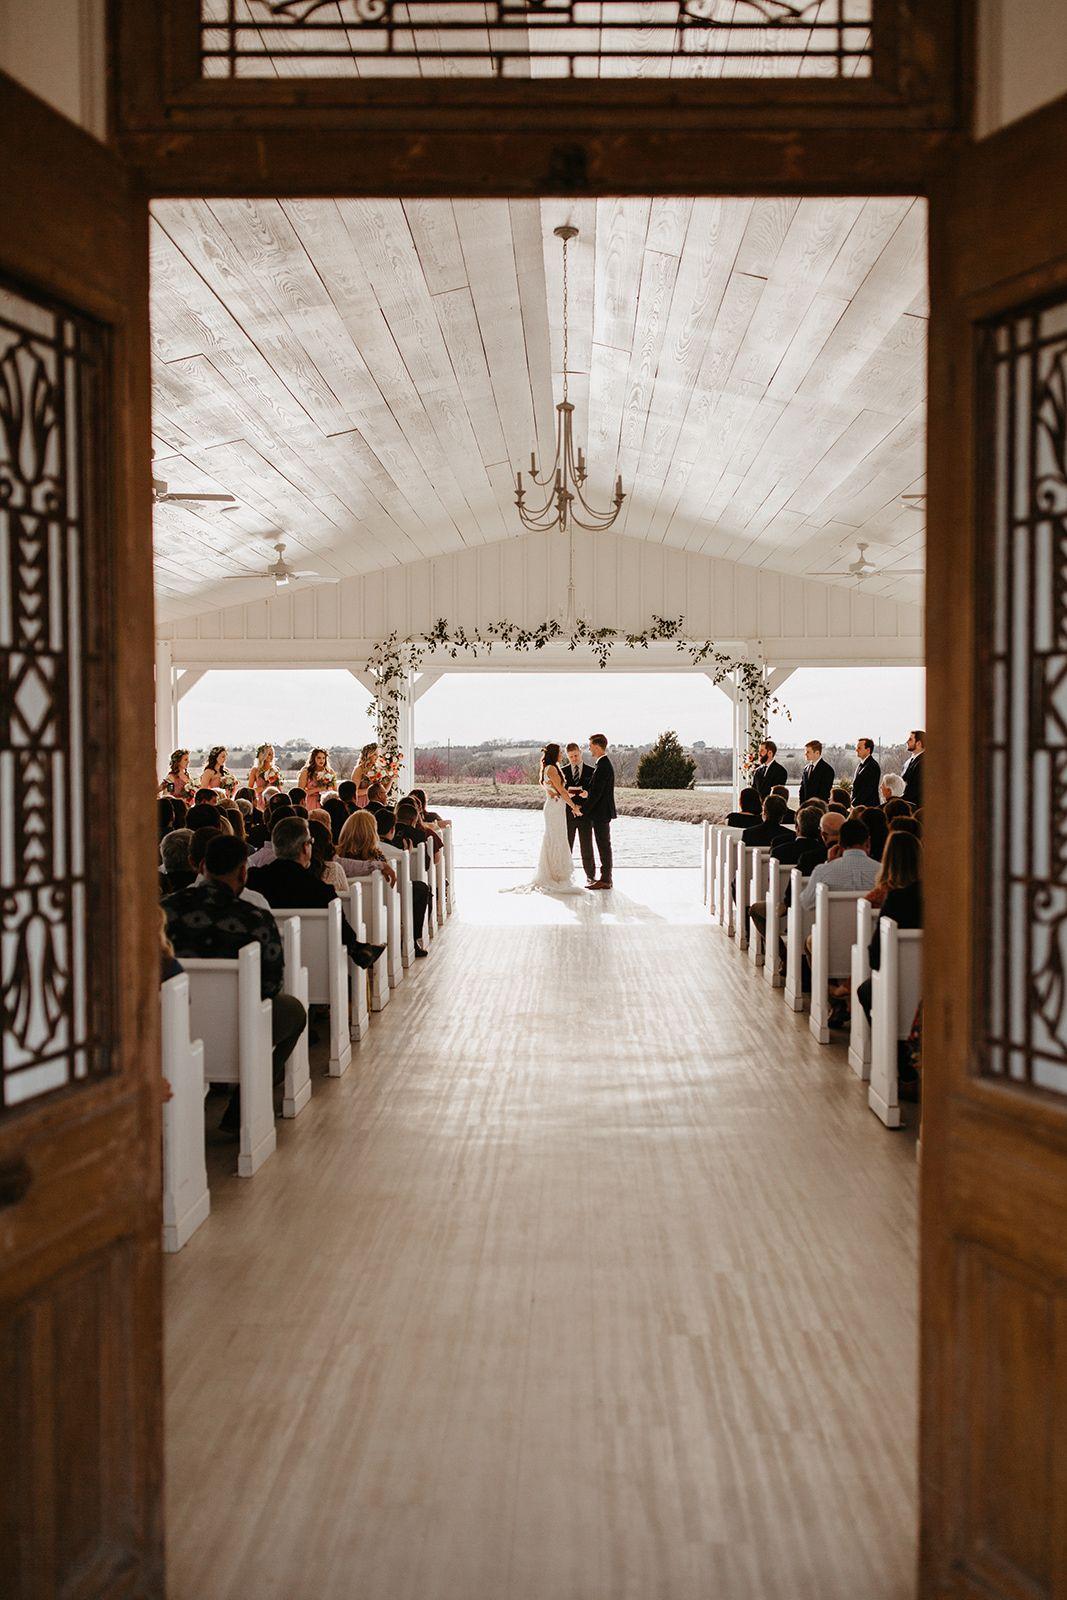 Modern wedding decor images  Spring Grand Ivory Dallas Ceremony Wedding Venue Modern Ceremony